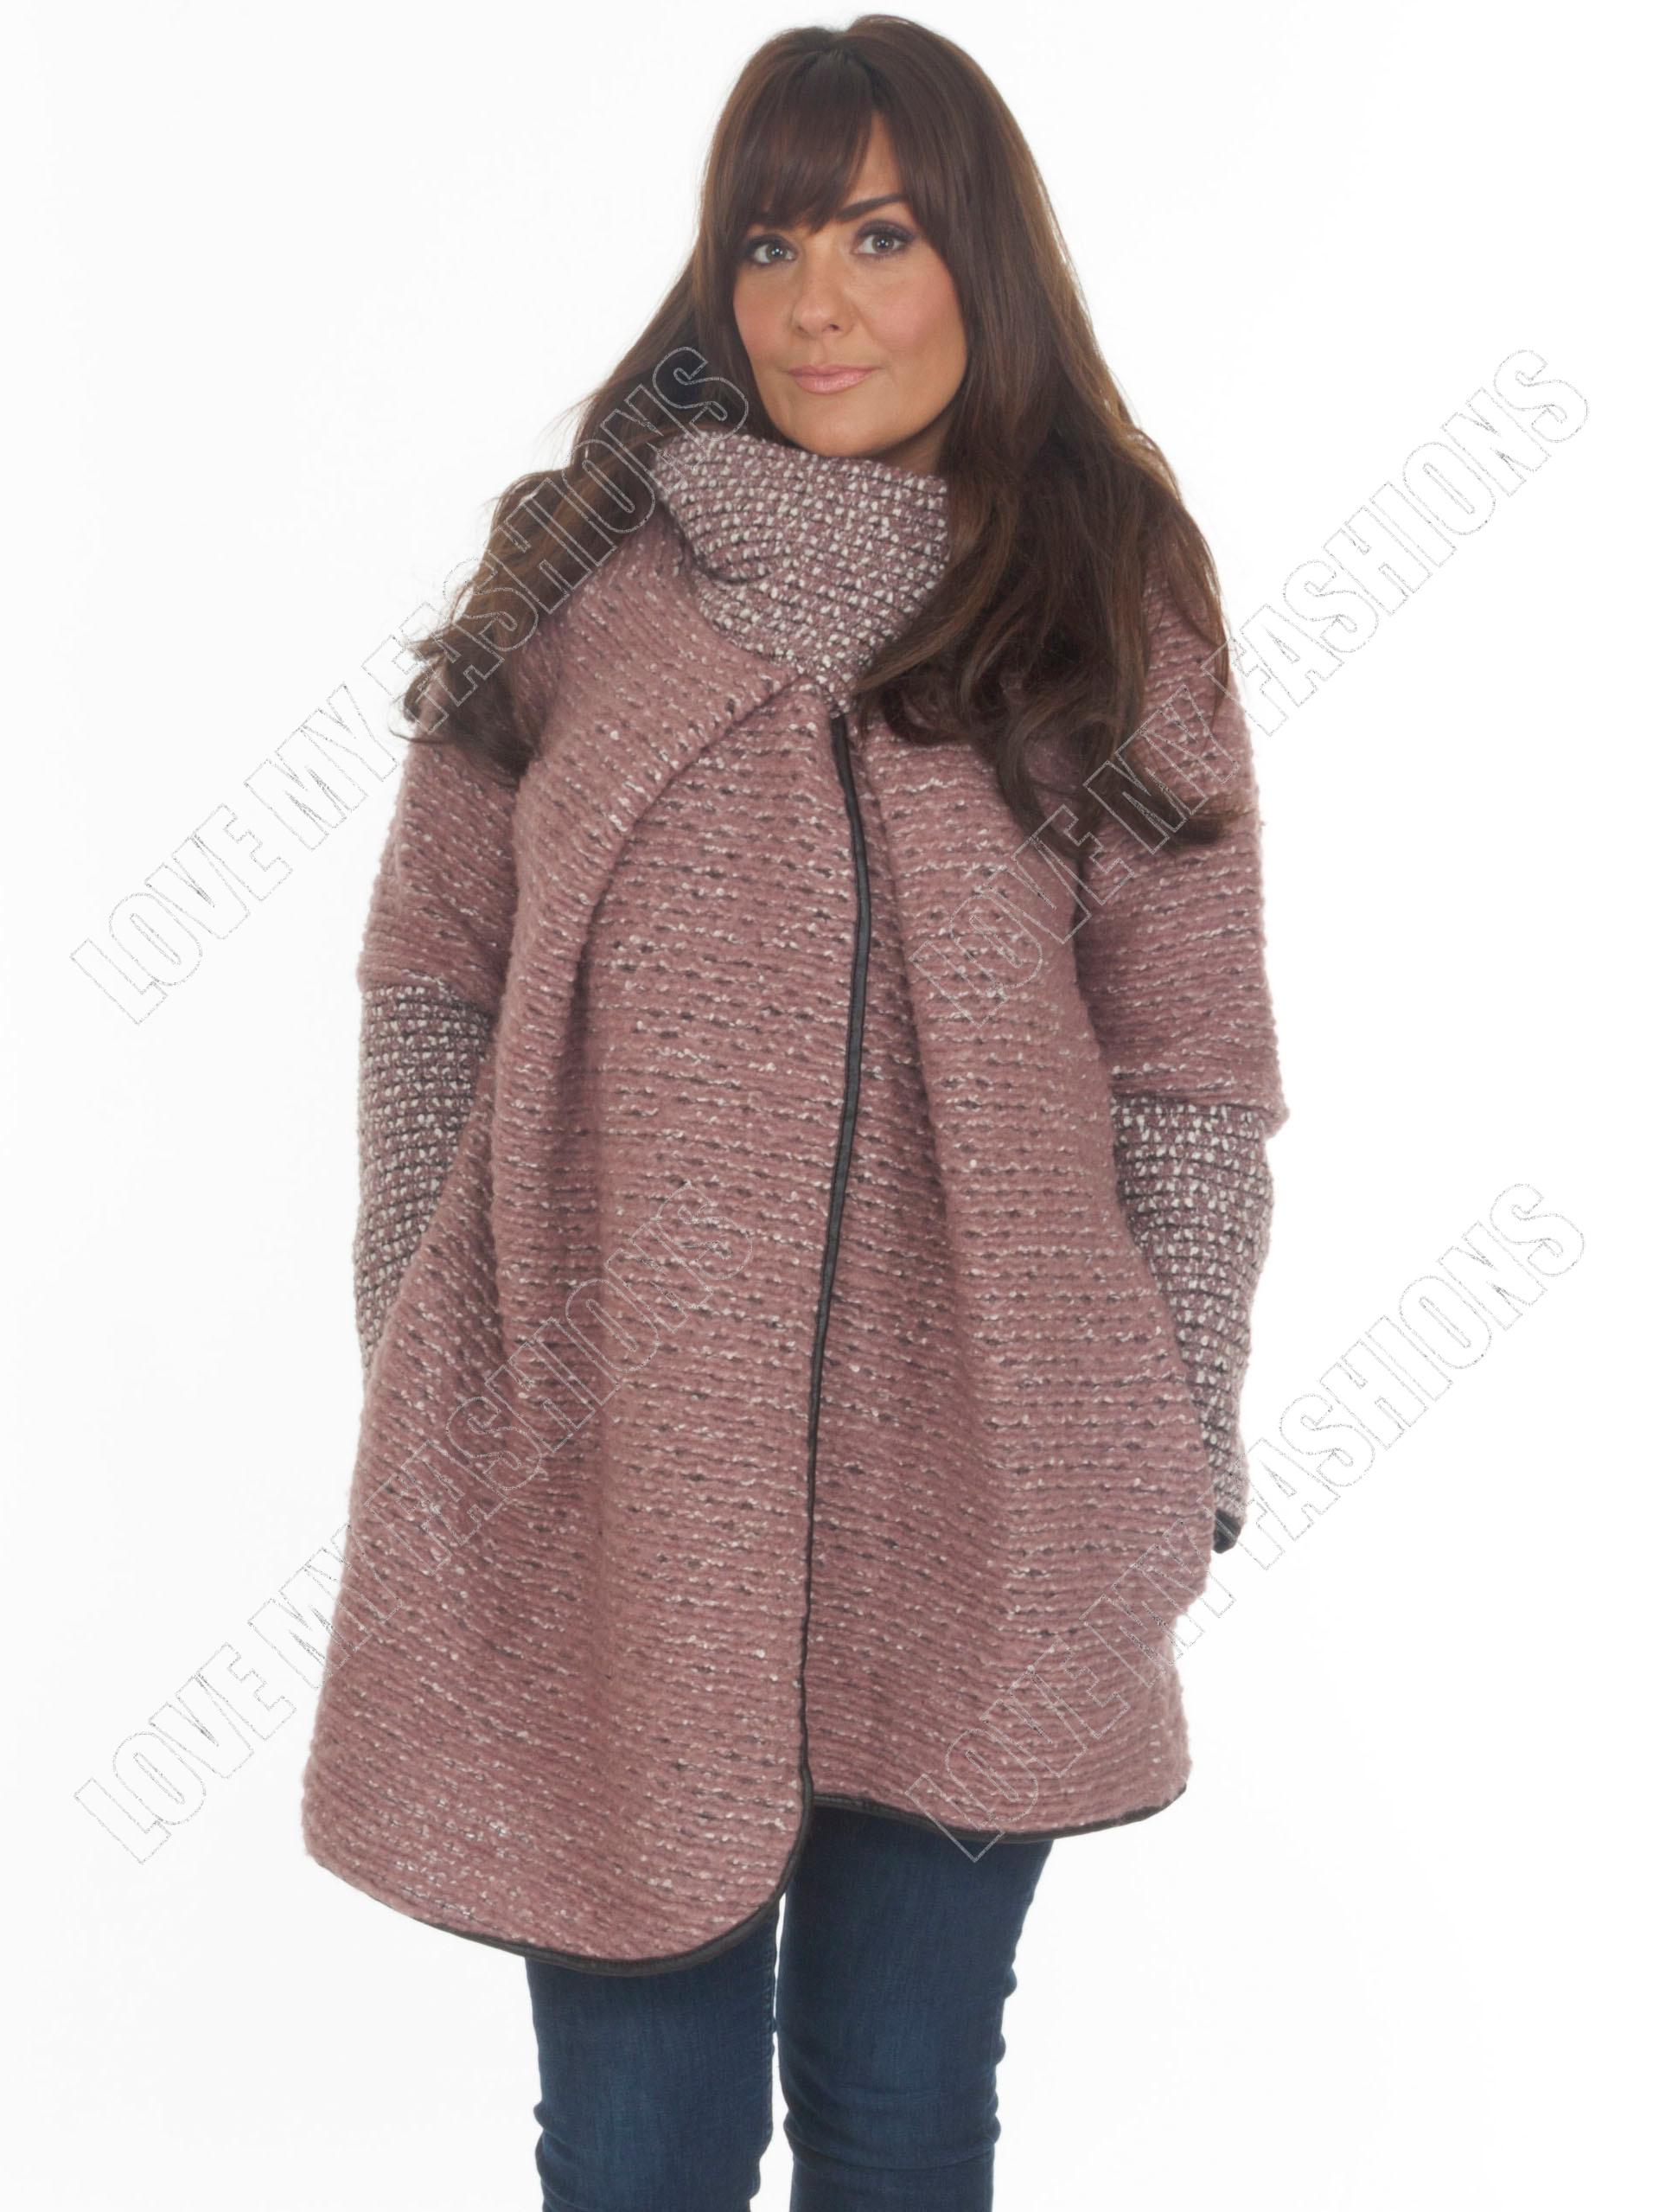 Cape coats for women